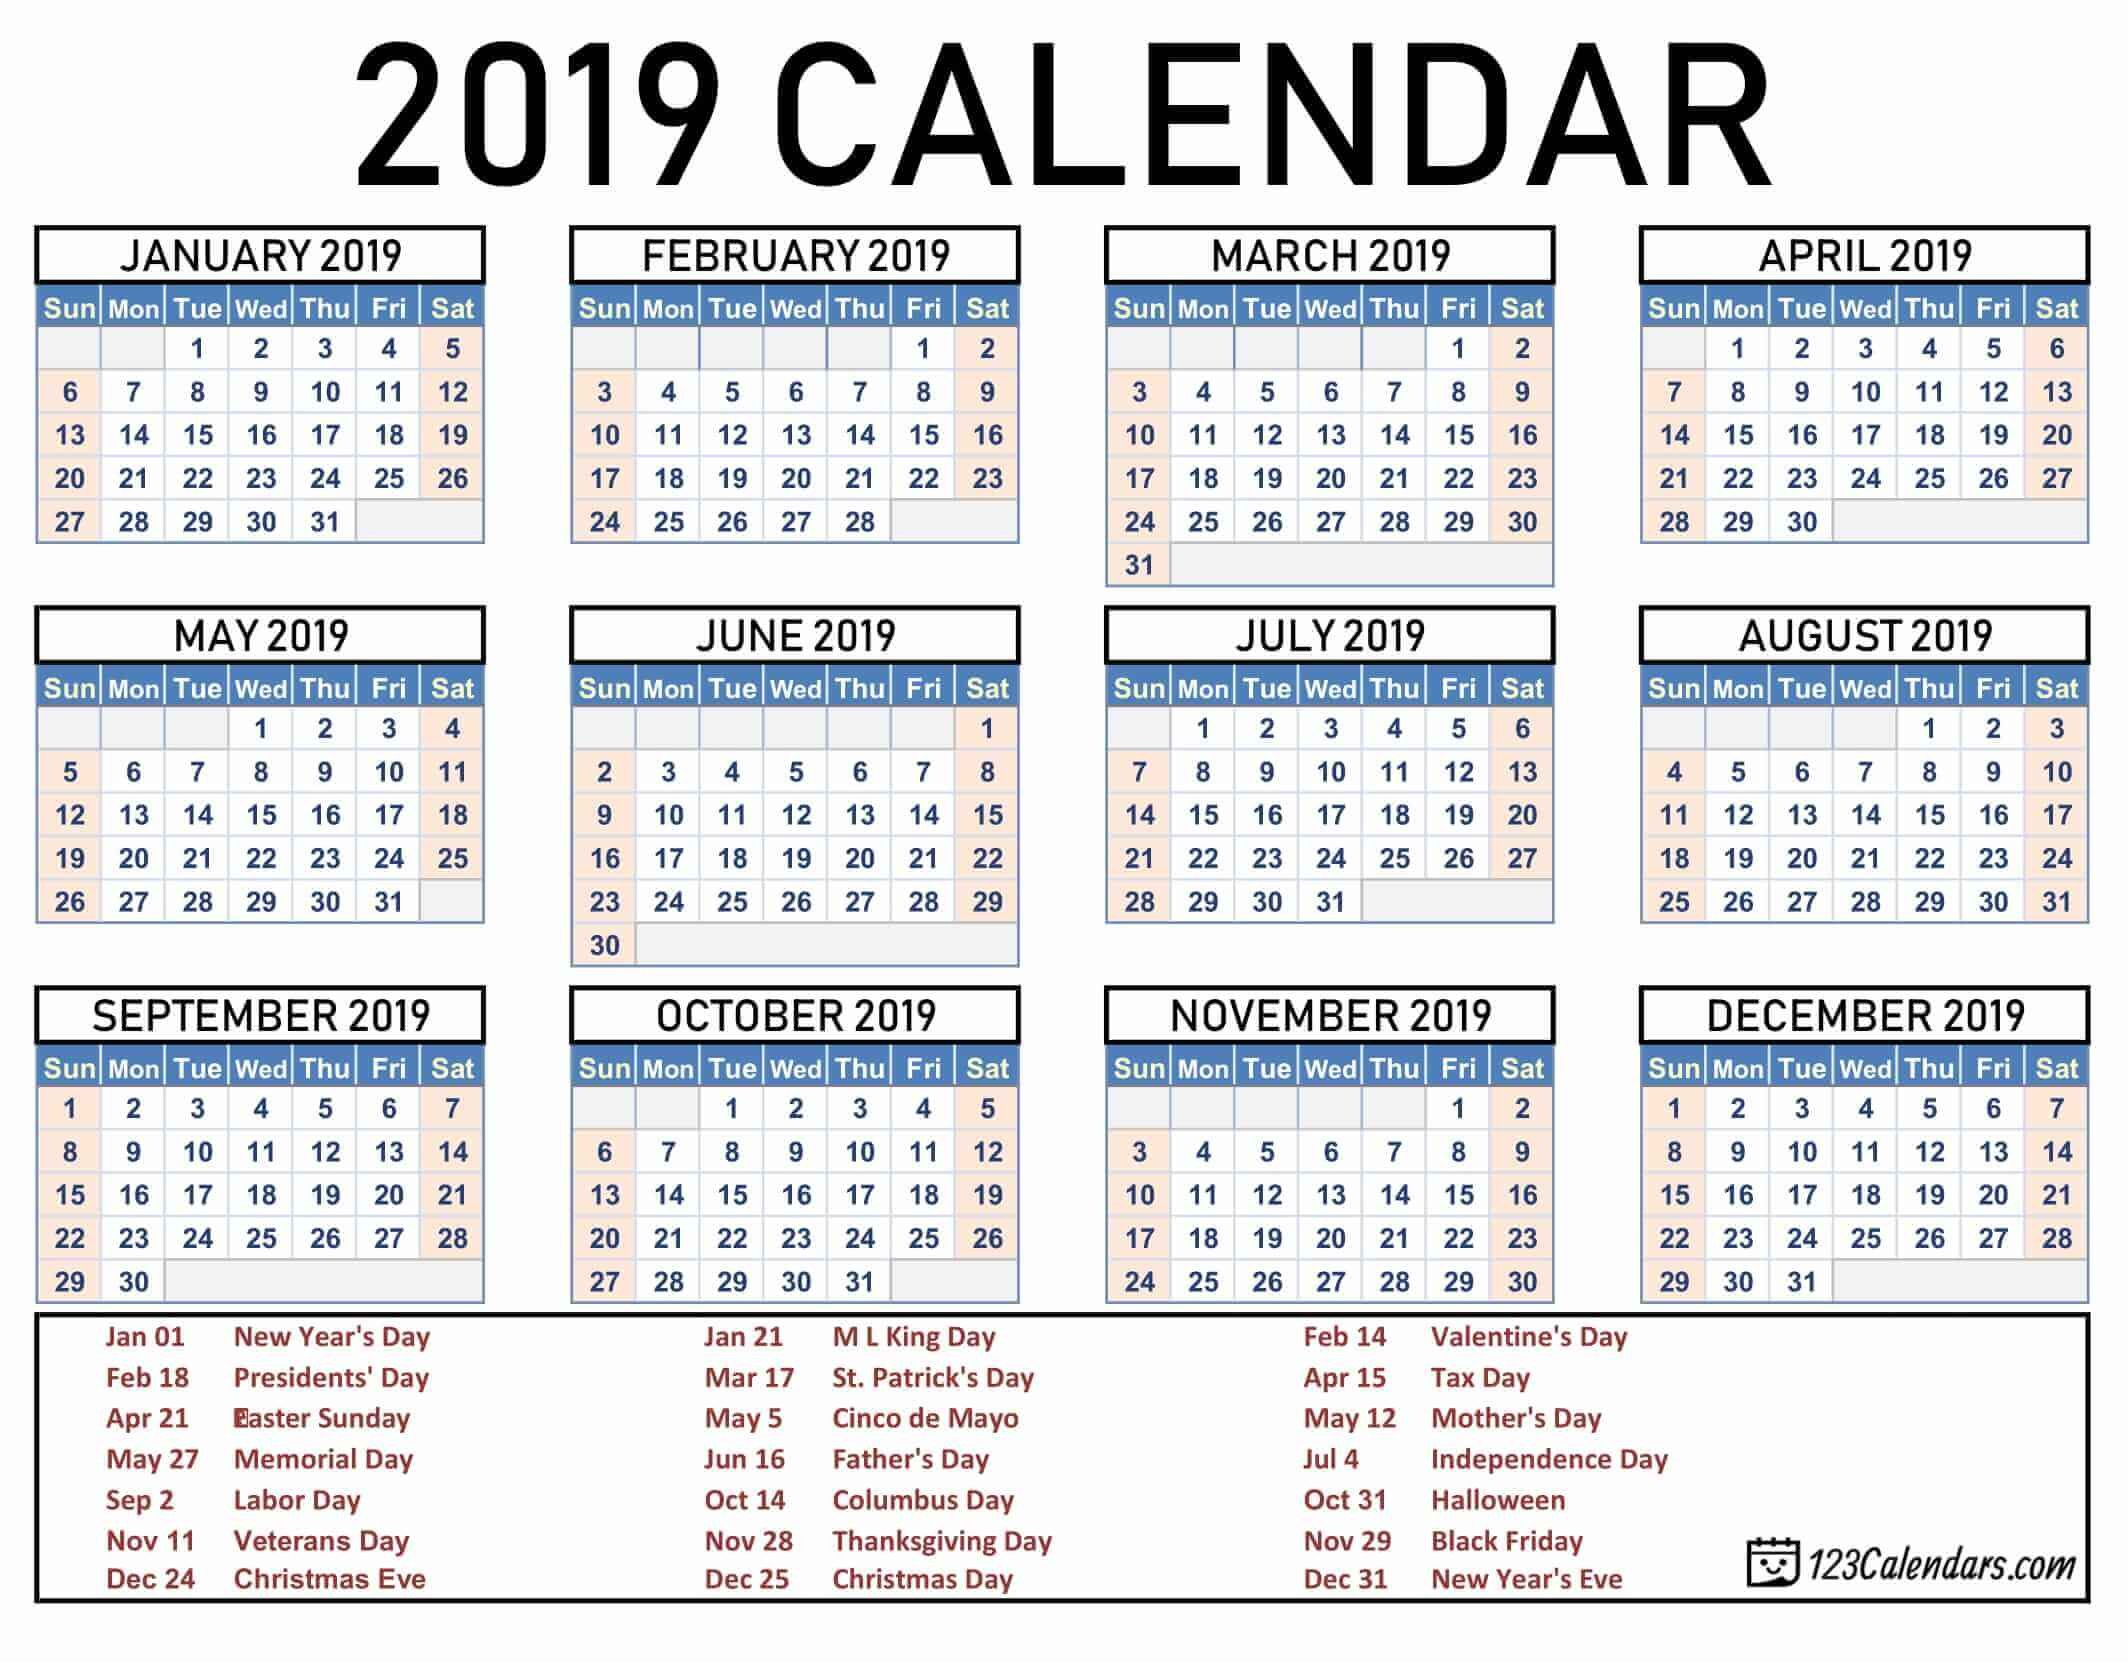 Free Printable Calendar with Holidays 2019 Free Printable 2019 Calendar